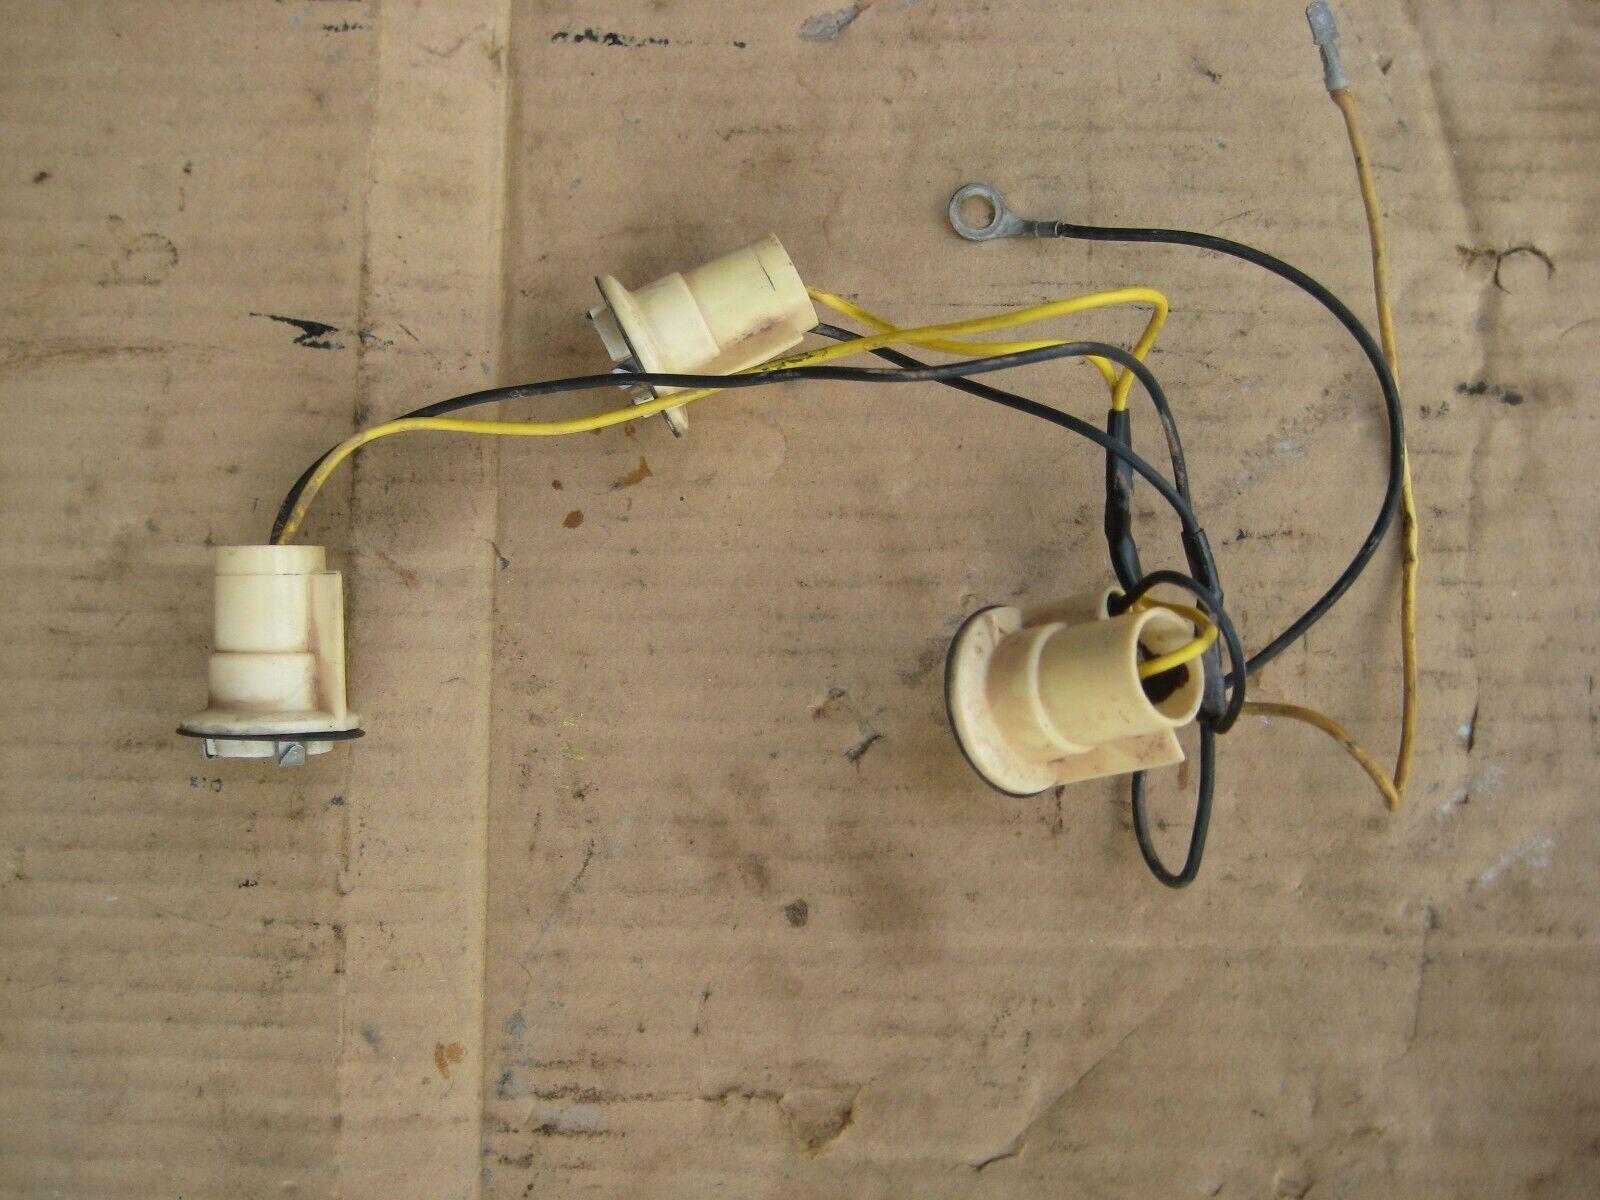 Genuine John Deere AM105556 Wiring Harness for sale online | eBayeBay